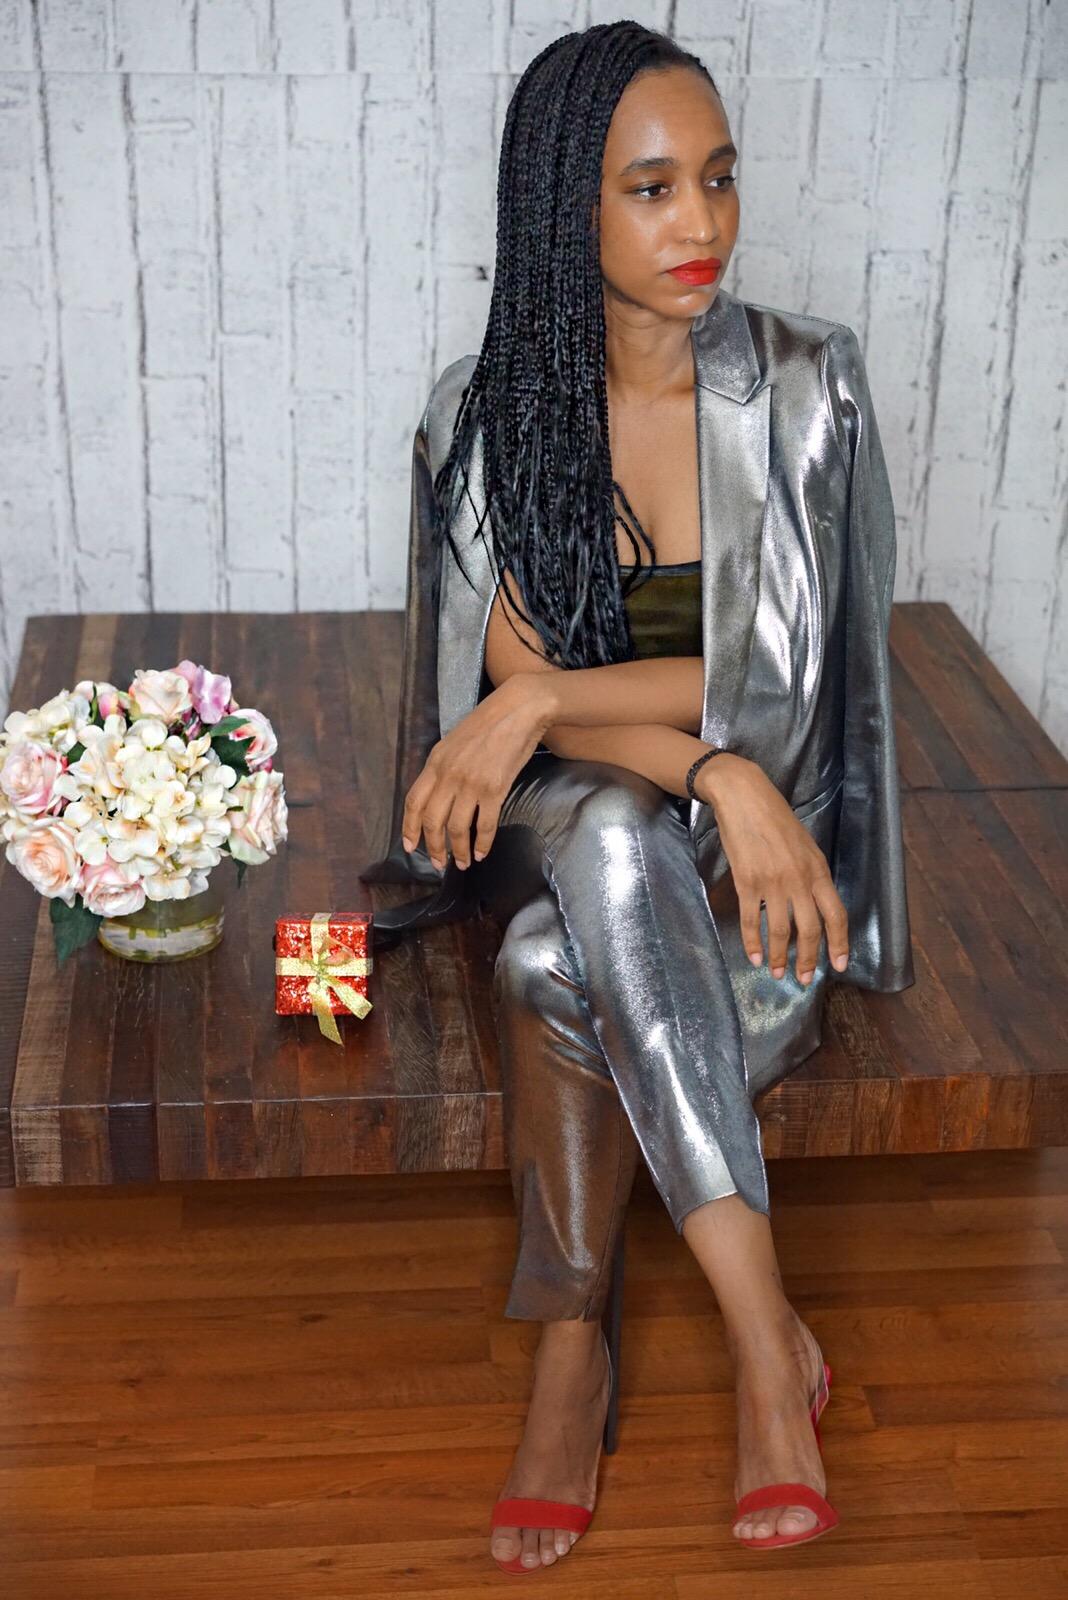 christine_the_style_affaire_bcbgmaxmara_steve_madden_shoes_topshop_suit_blazer_pants_trousers_fenty_beauty_red_lipcolor_by_rihanna_christmas_colors_bodysuit_joy_metallic_holidays.jpg